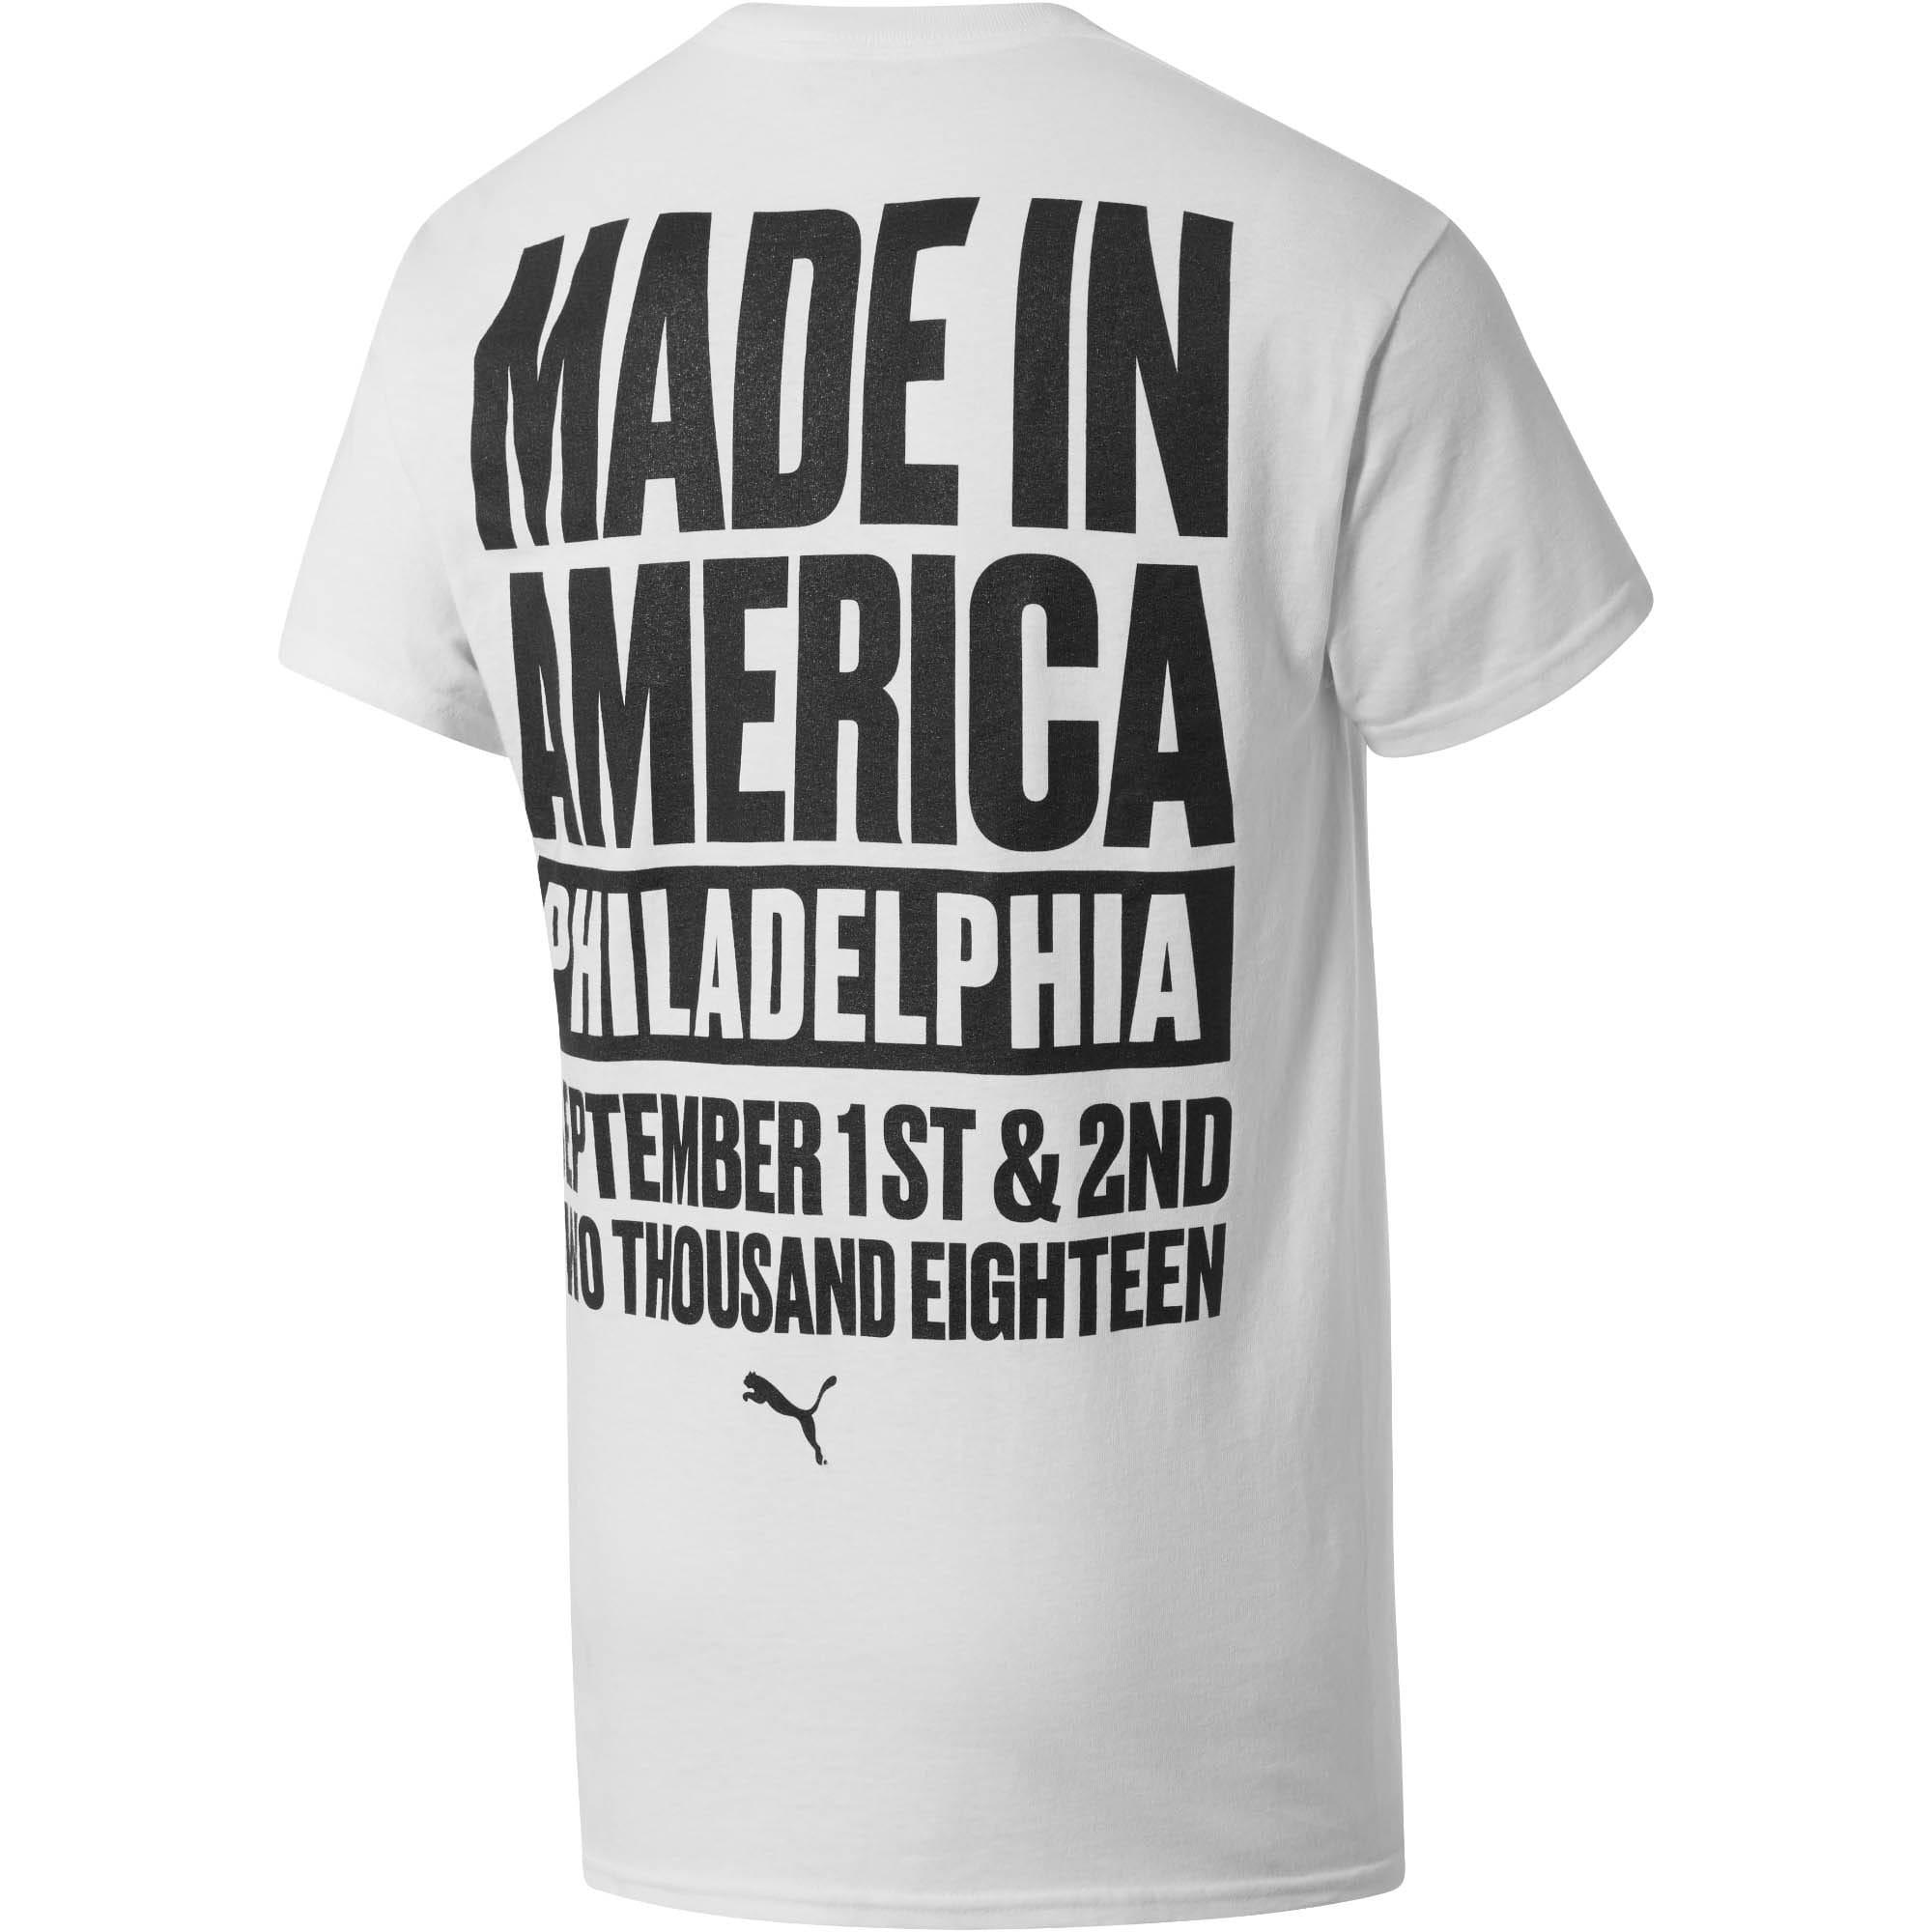 Thumbnail 2 of PUMA Equality x MIA x Josh Vides Men's Classic Short Sleeve T-Shirt with Pocket, White, medium